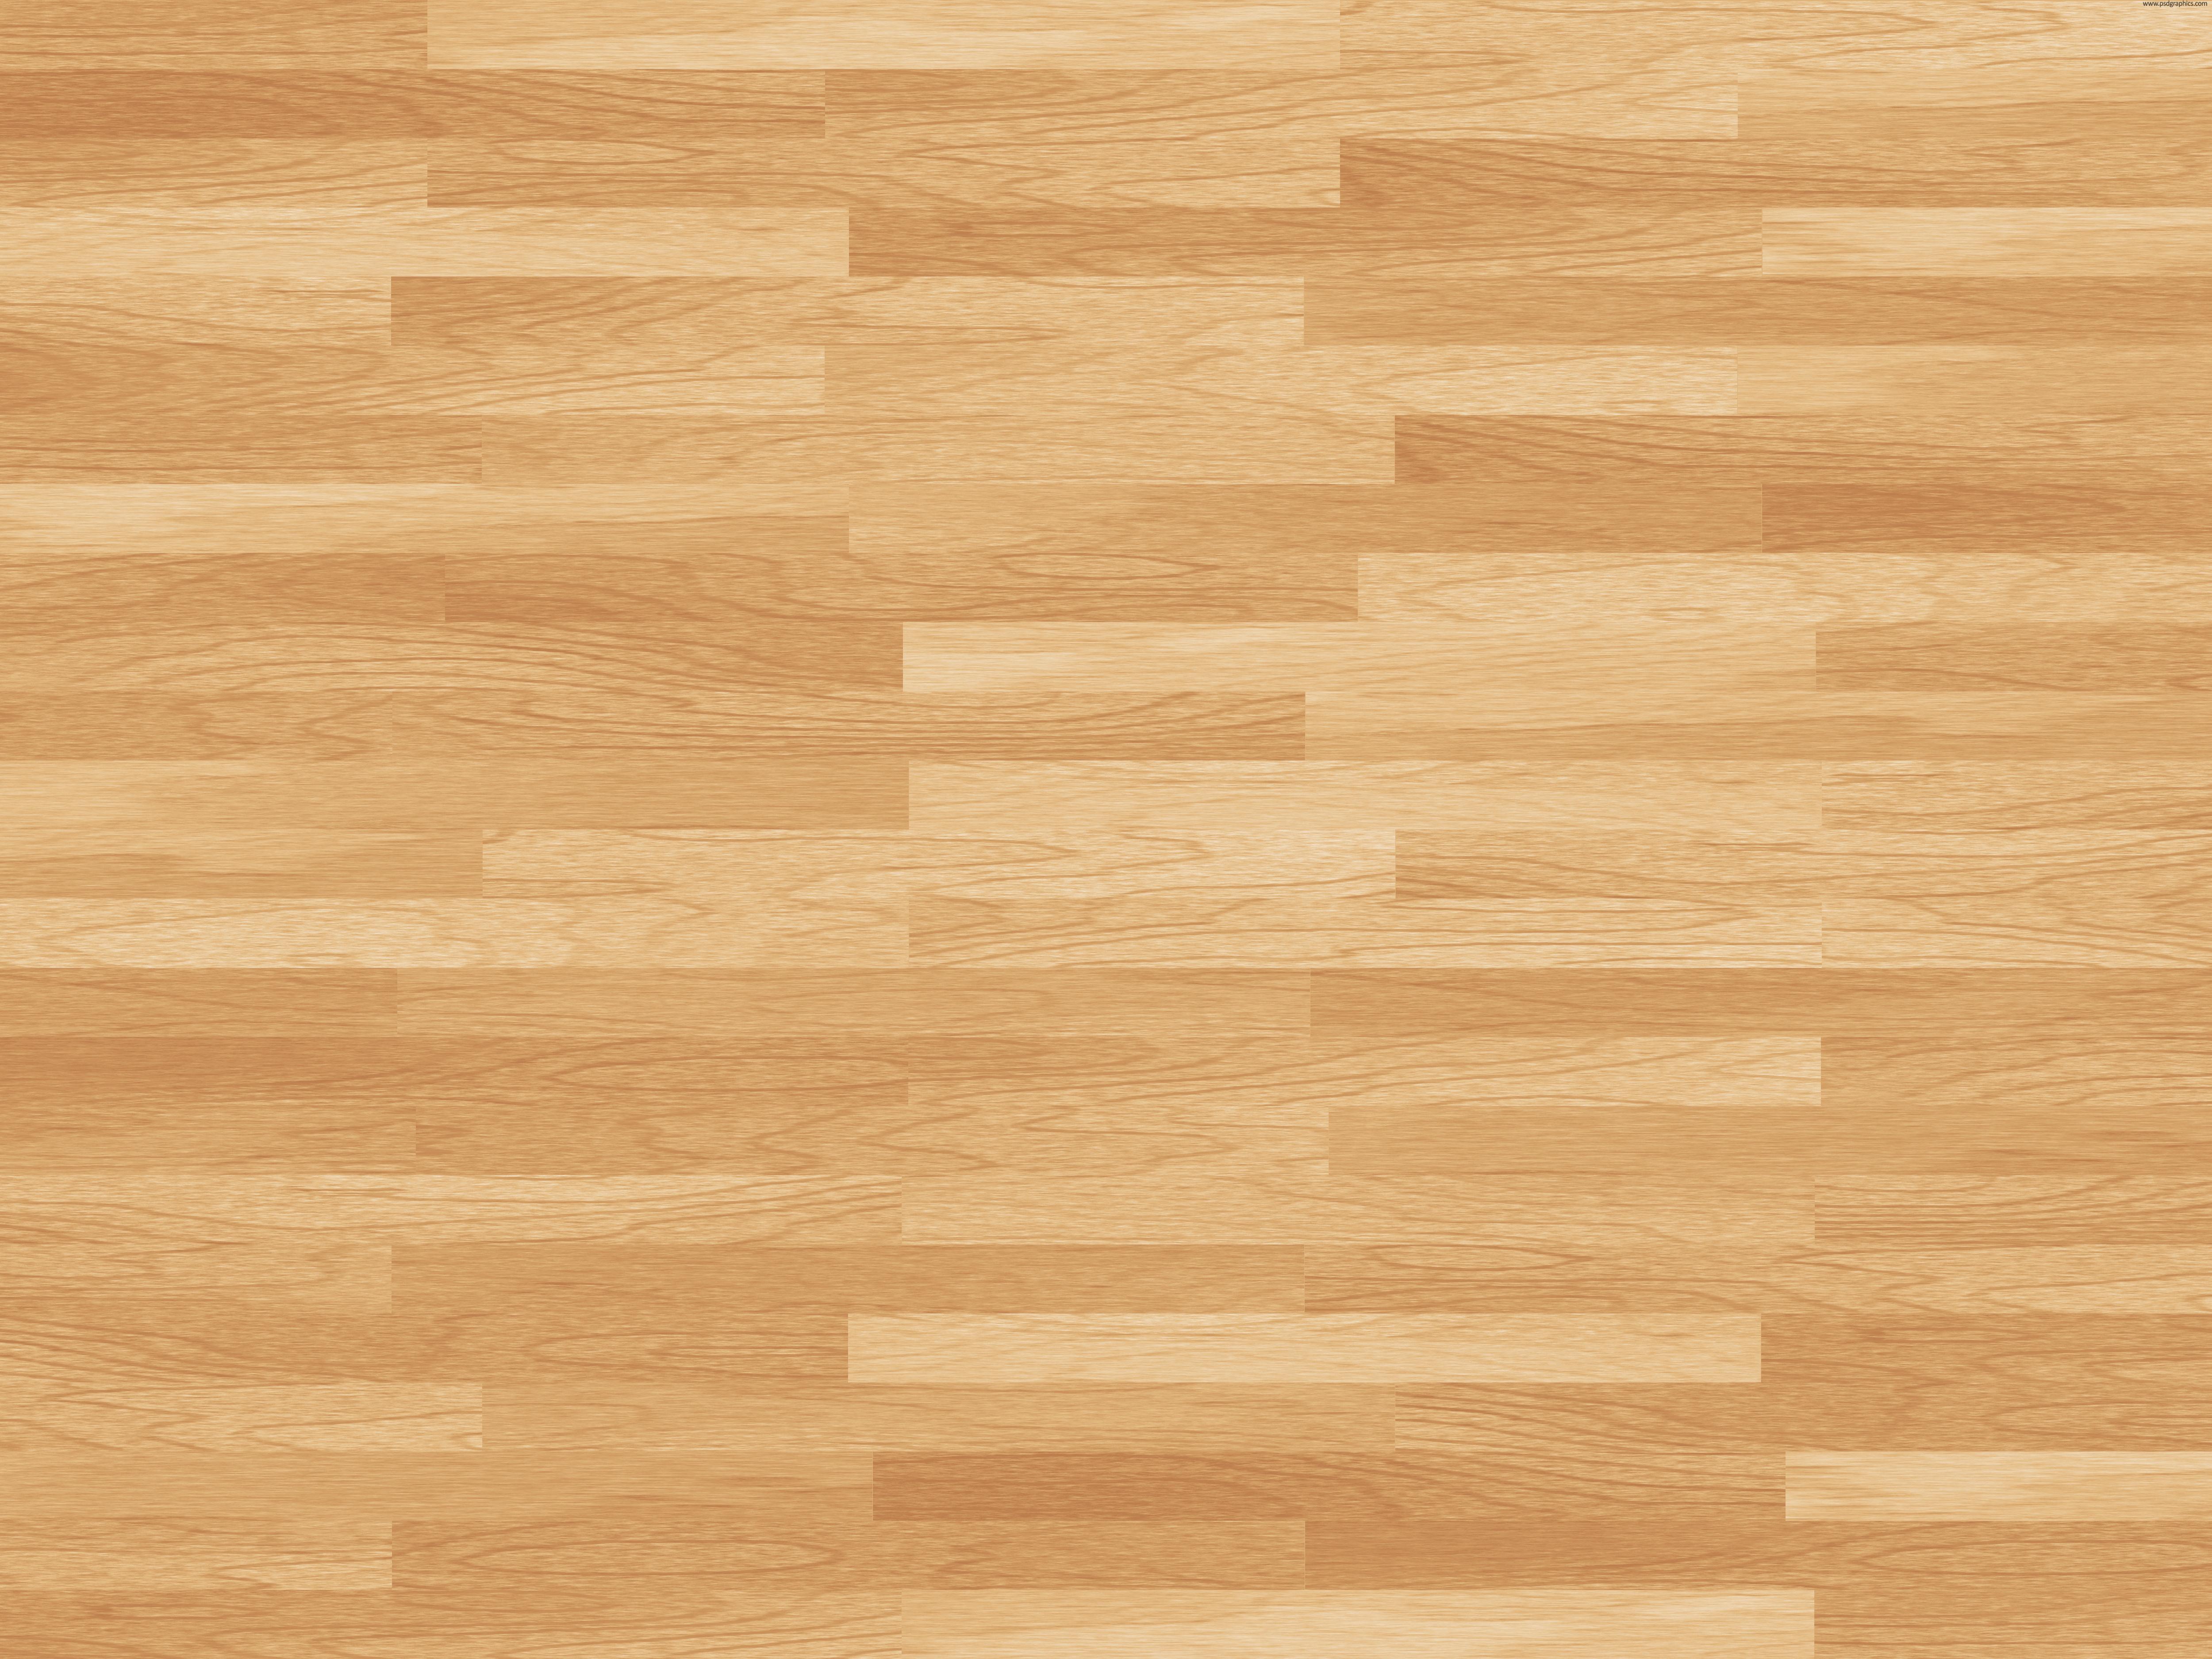 Basketball floor texture PSDGraphics 5000x3750